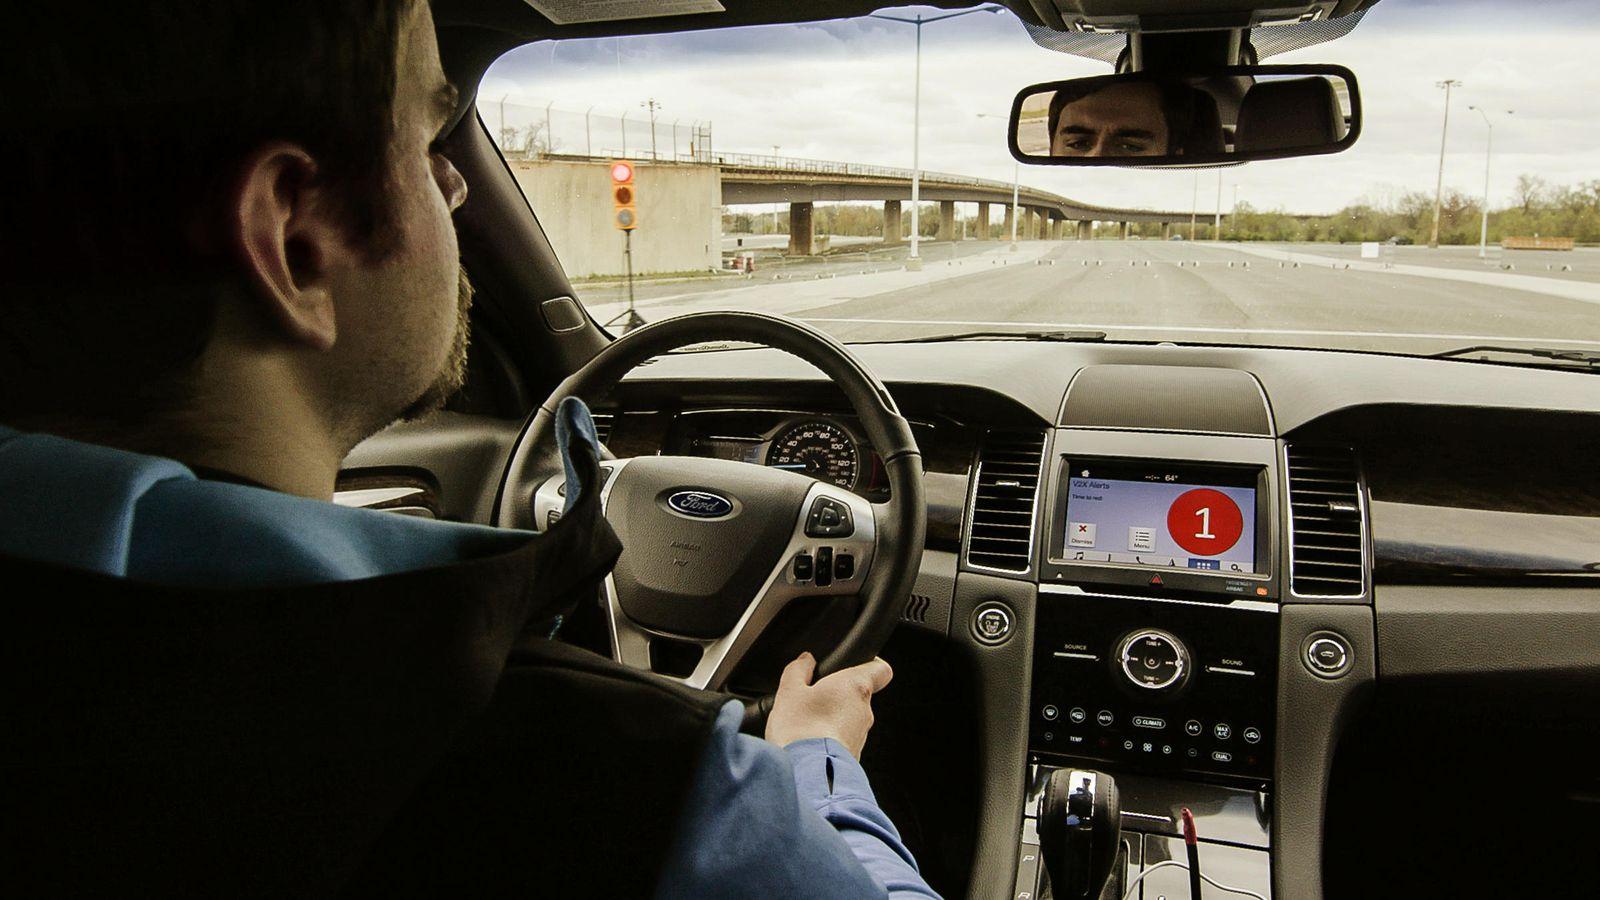 Ford Says C-V2X Technology Could Make Roads Safer